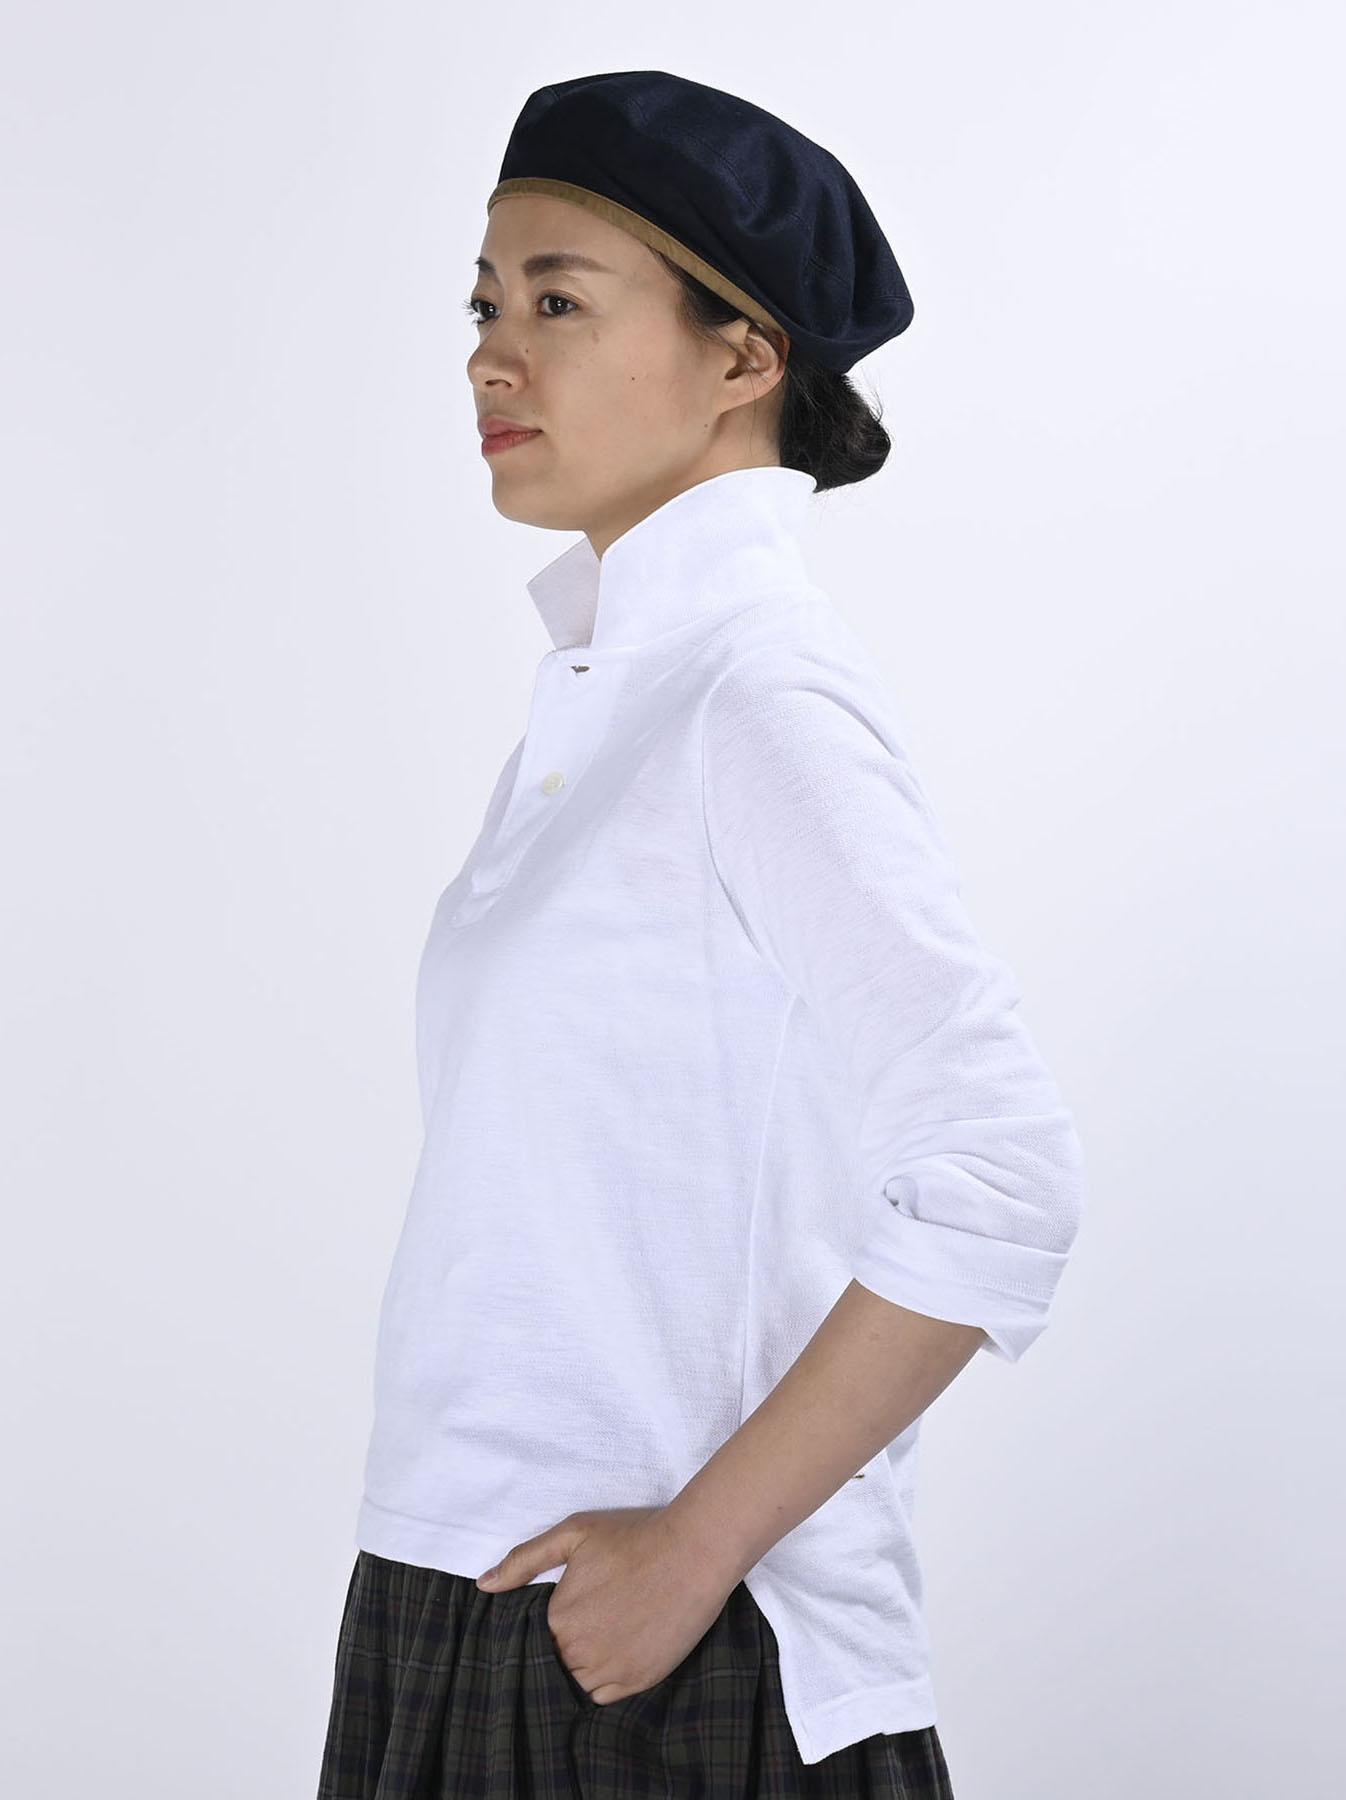 Kanoko Shiokaze Long-sleeved Square Polo Shirt (0521)-4